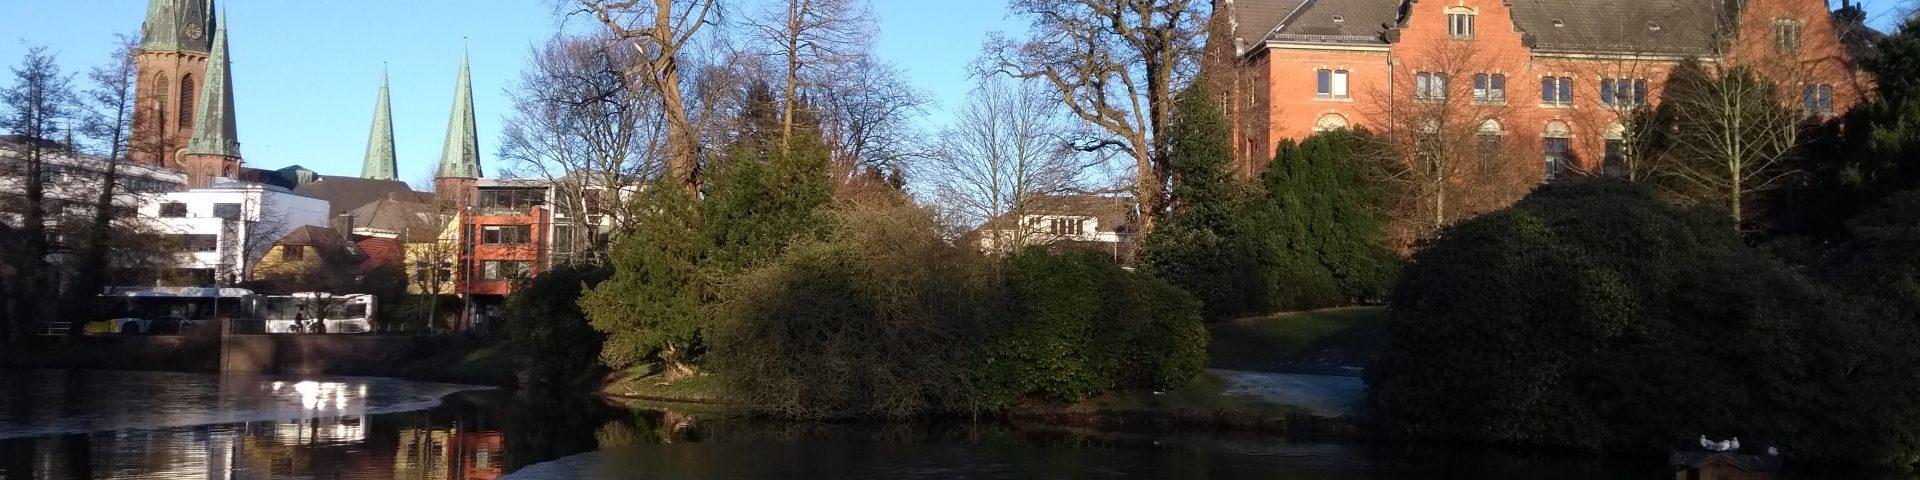 Schlossgarten in Oldenburg